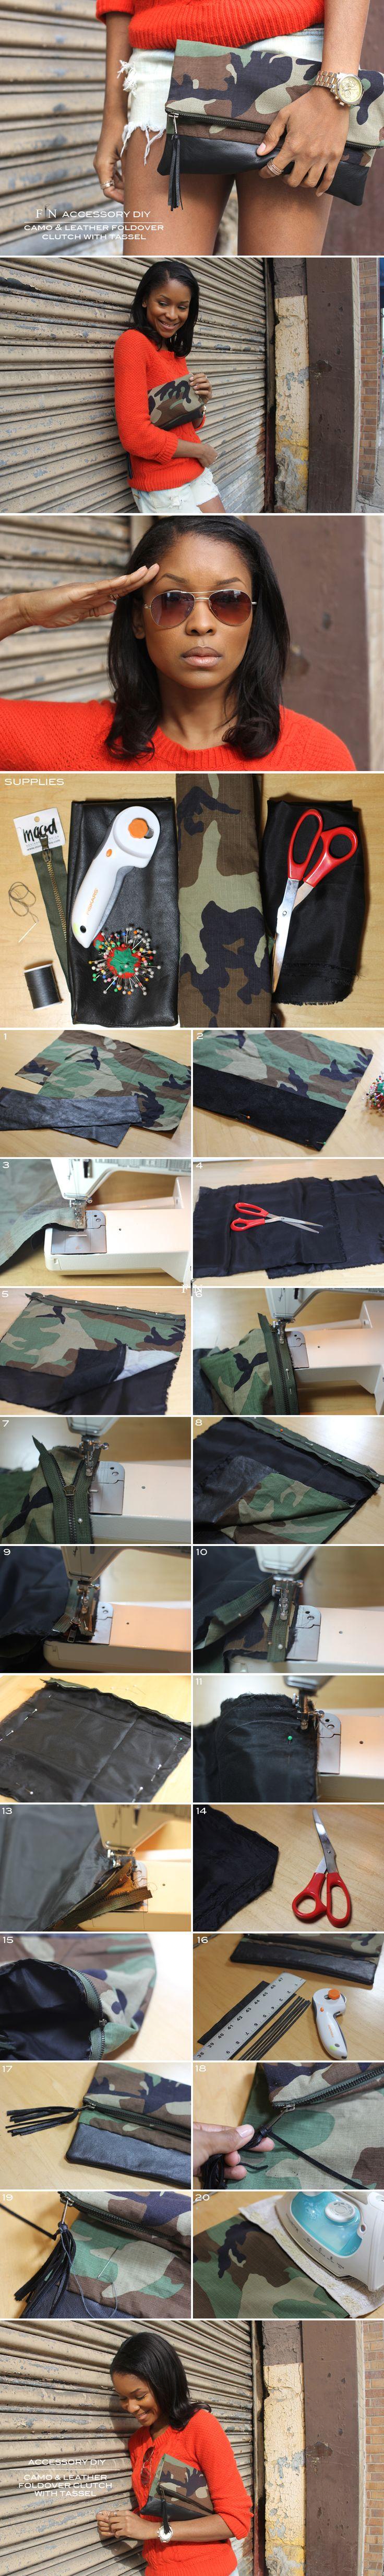 FRUGAL-NOMICS.COM DIY:  Camo and Leather Foldover Clutch with Tassel #DIY #Camo #Tassel #Clutch | Details on Frugal-nomics.com/diy